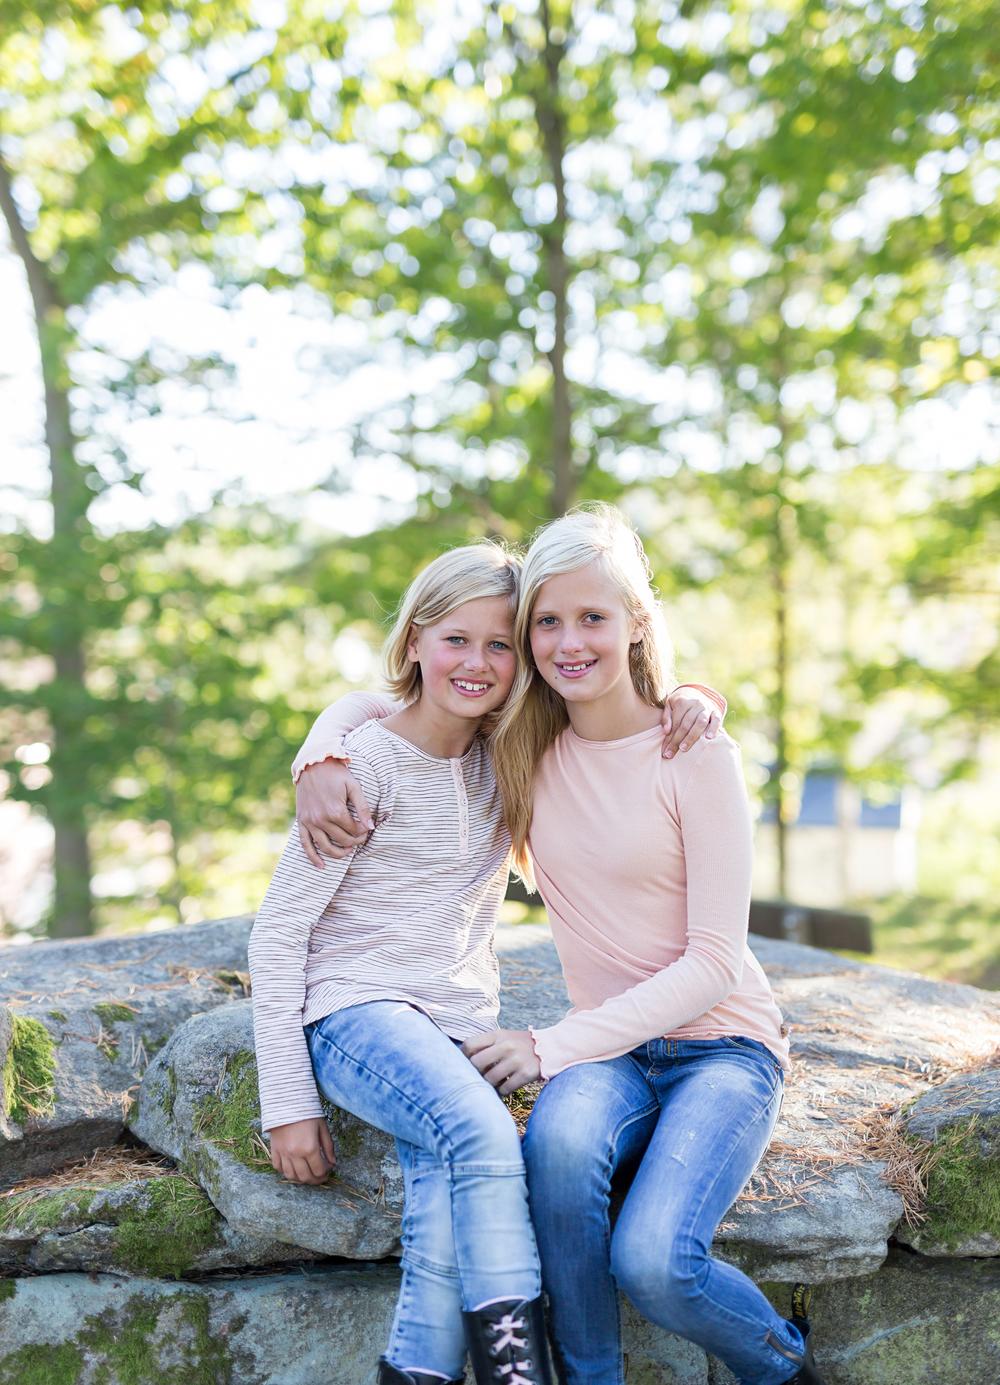 familjefotograf-borås-fotograf-madeleine4.jpg